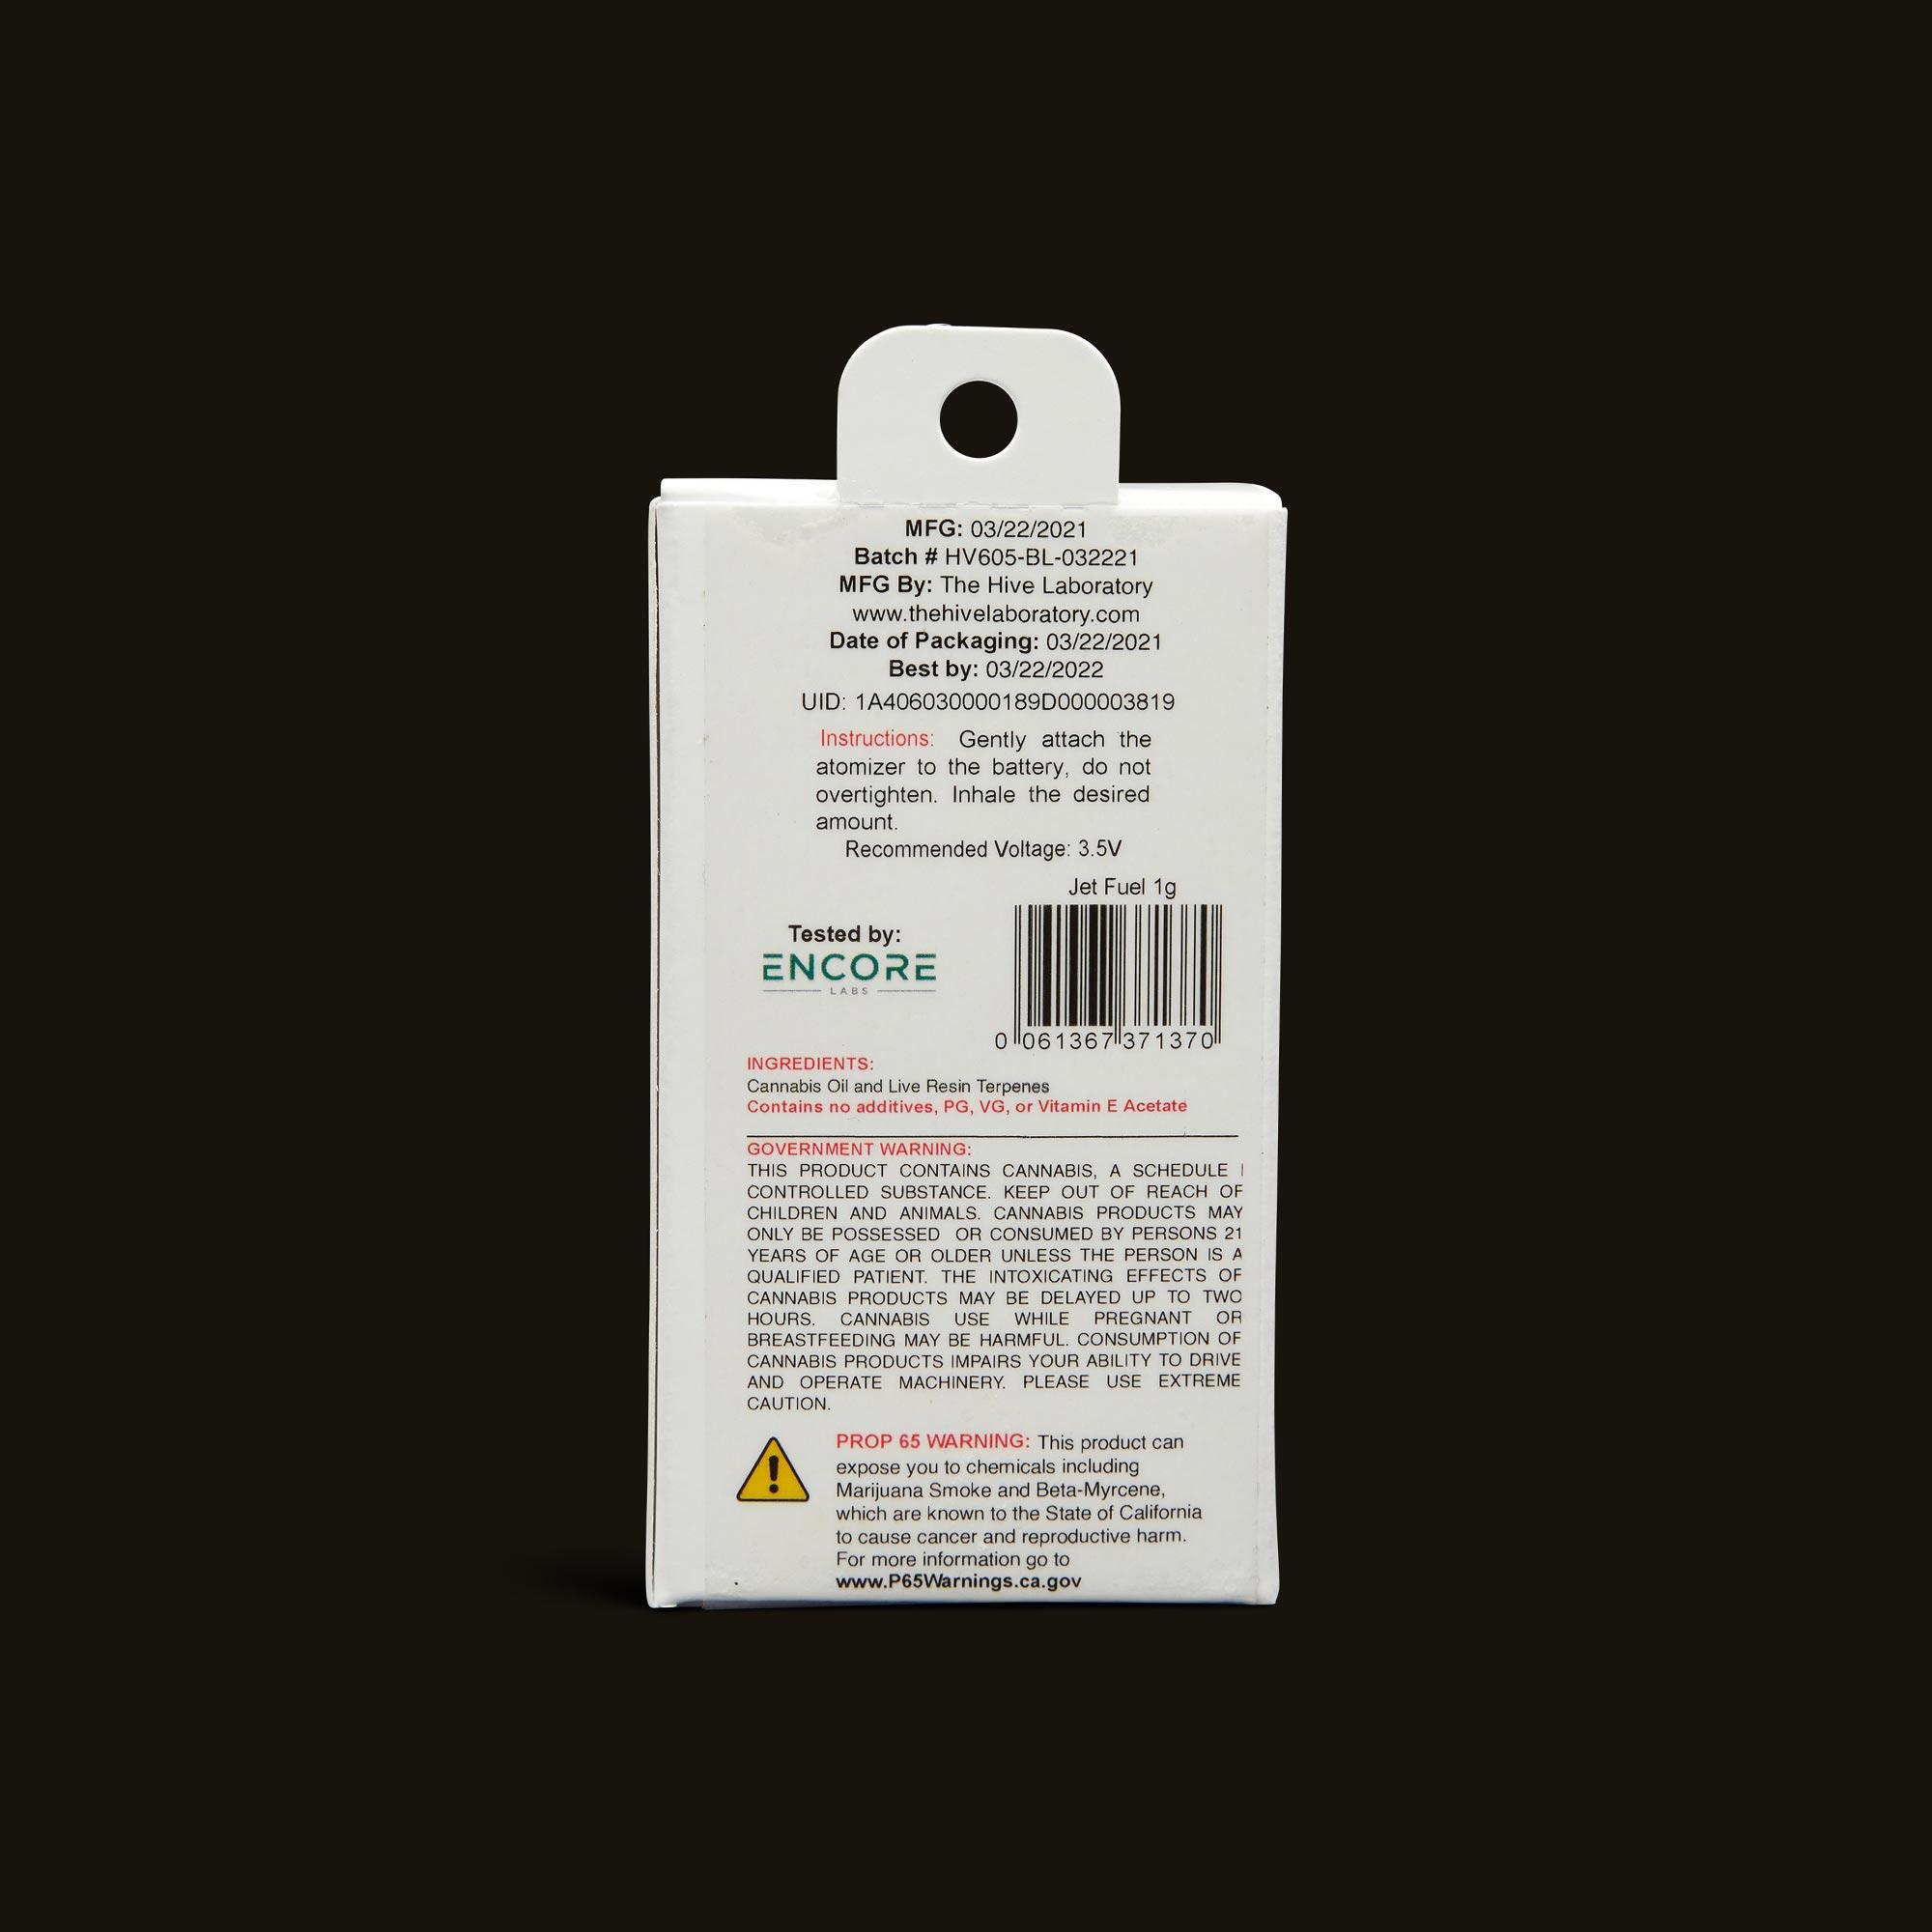 Bloom Brands Vape Pen - Jet Fuel Live Resin Cartridge - 1g